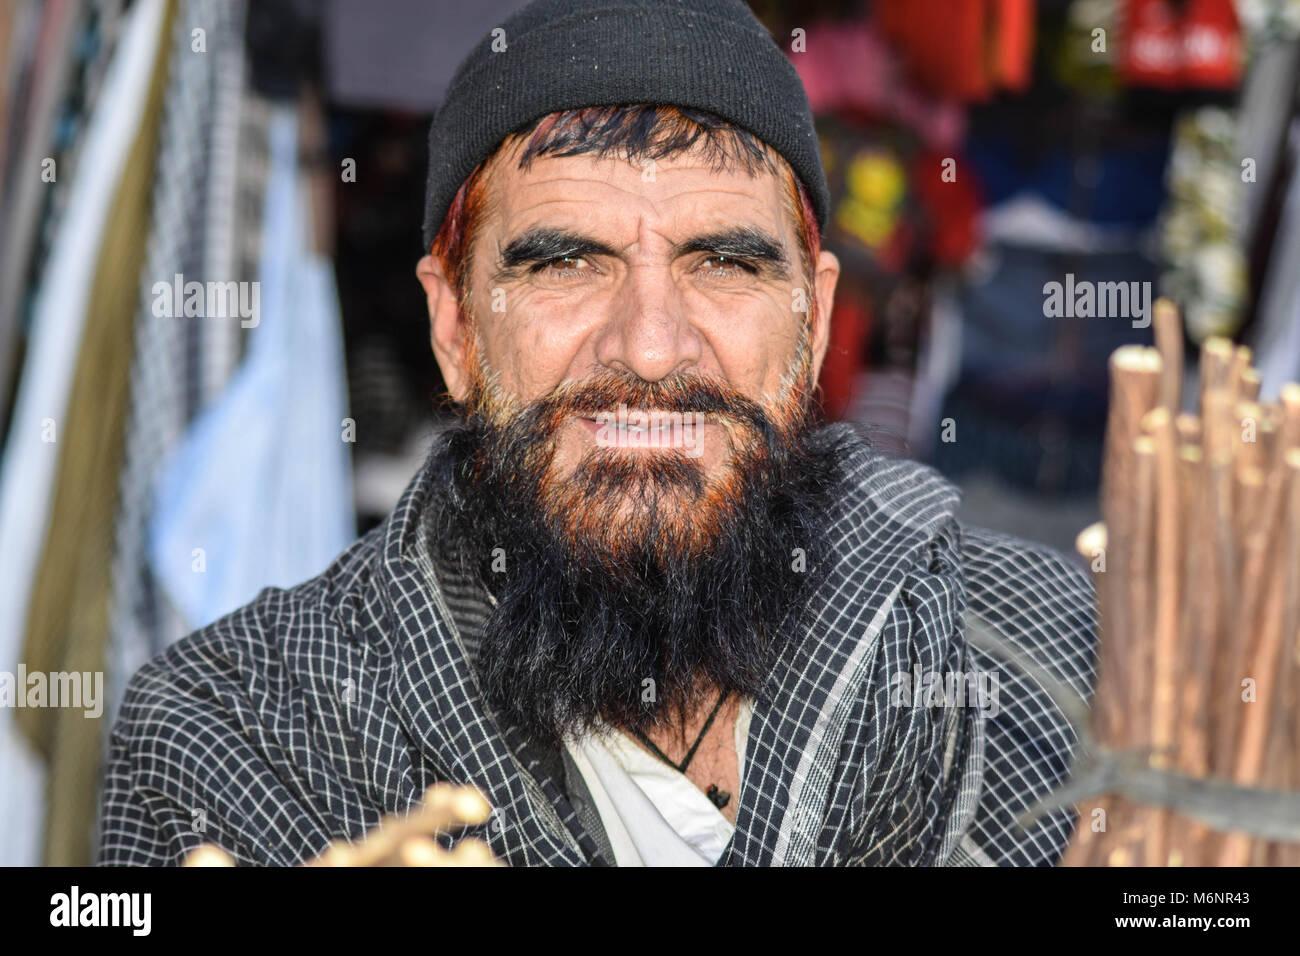 Afghan Man Miswak Seller - Stock Image